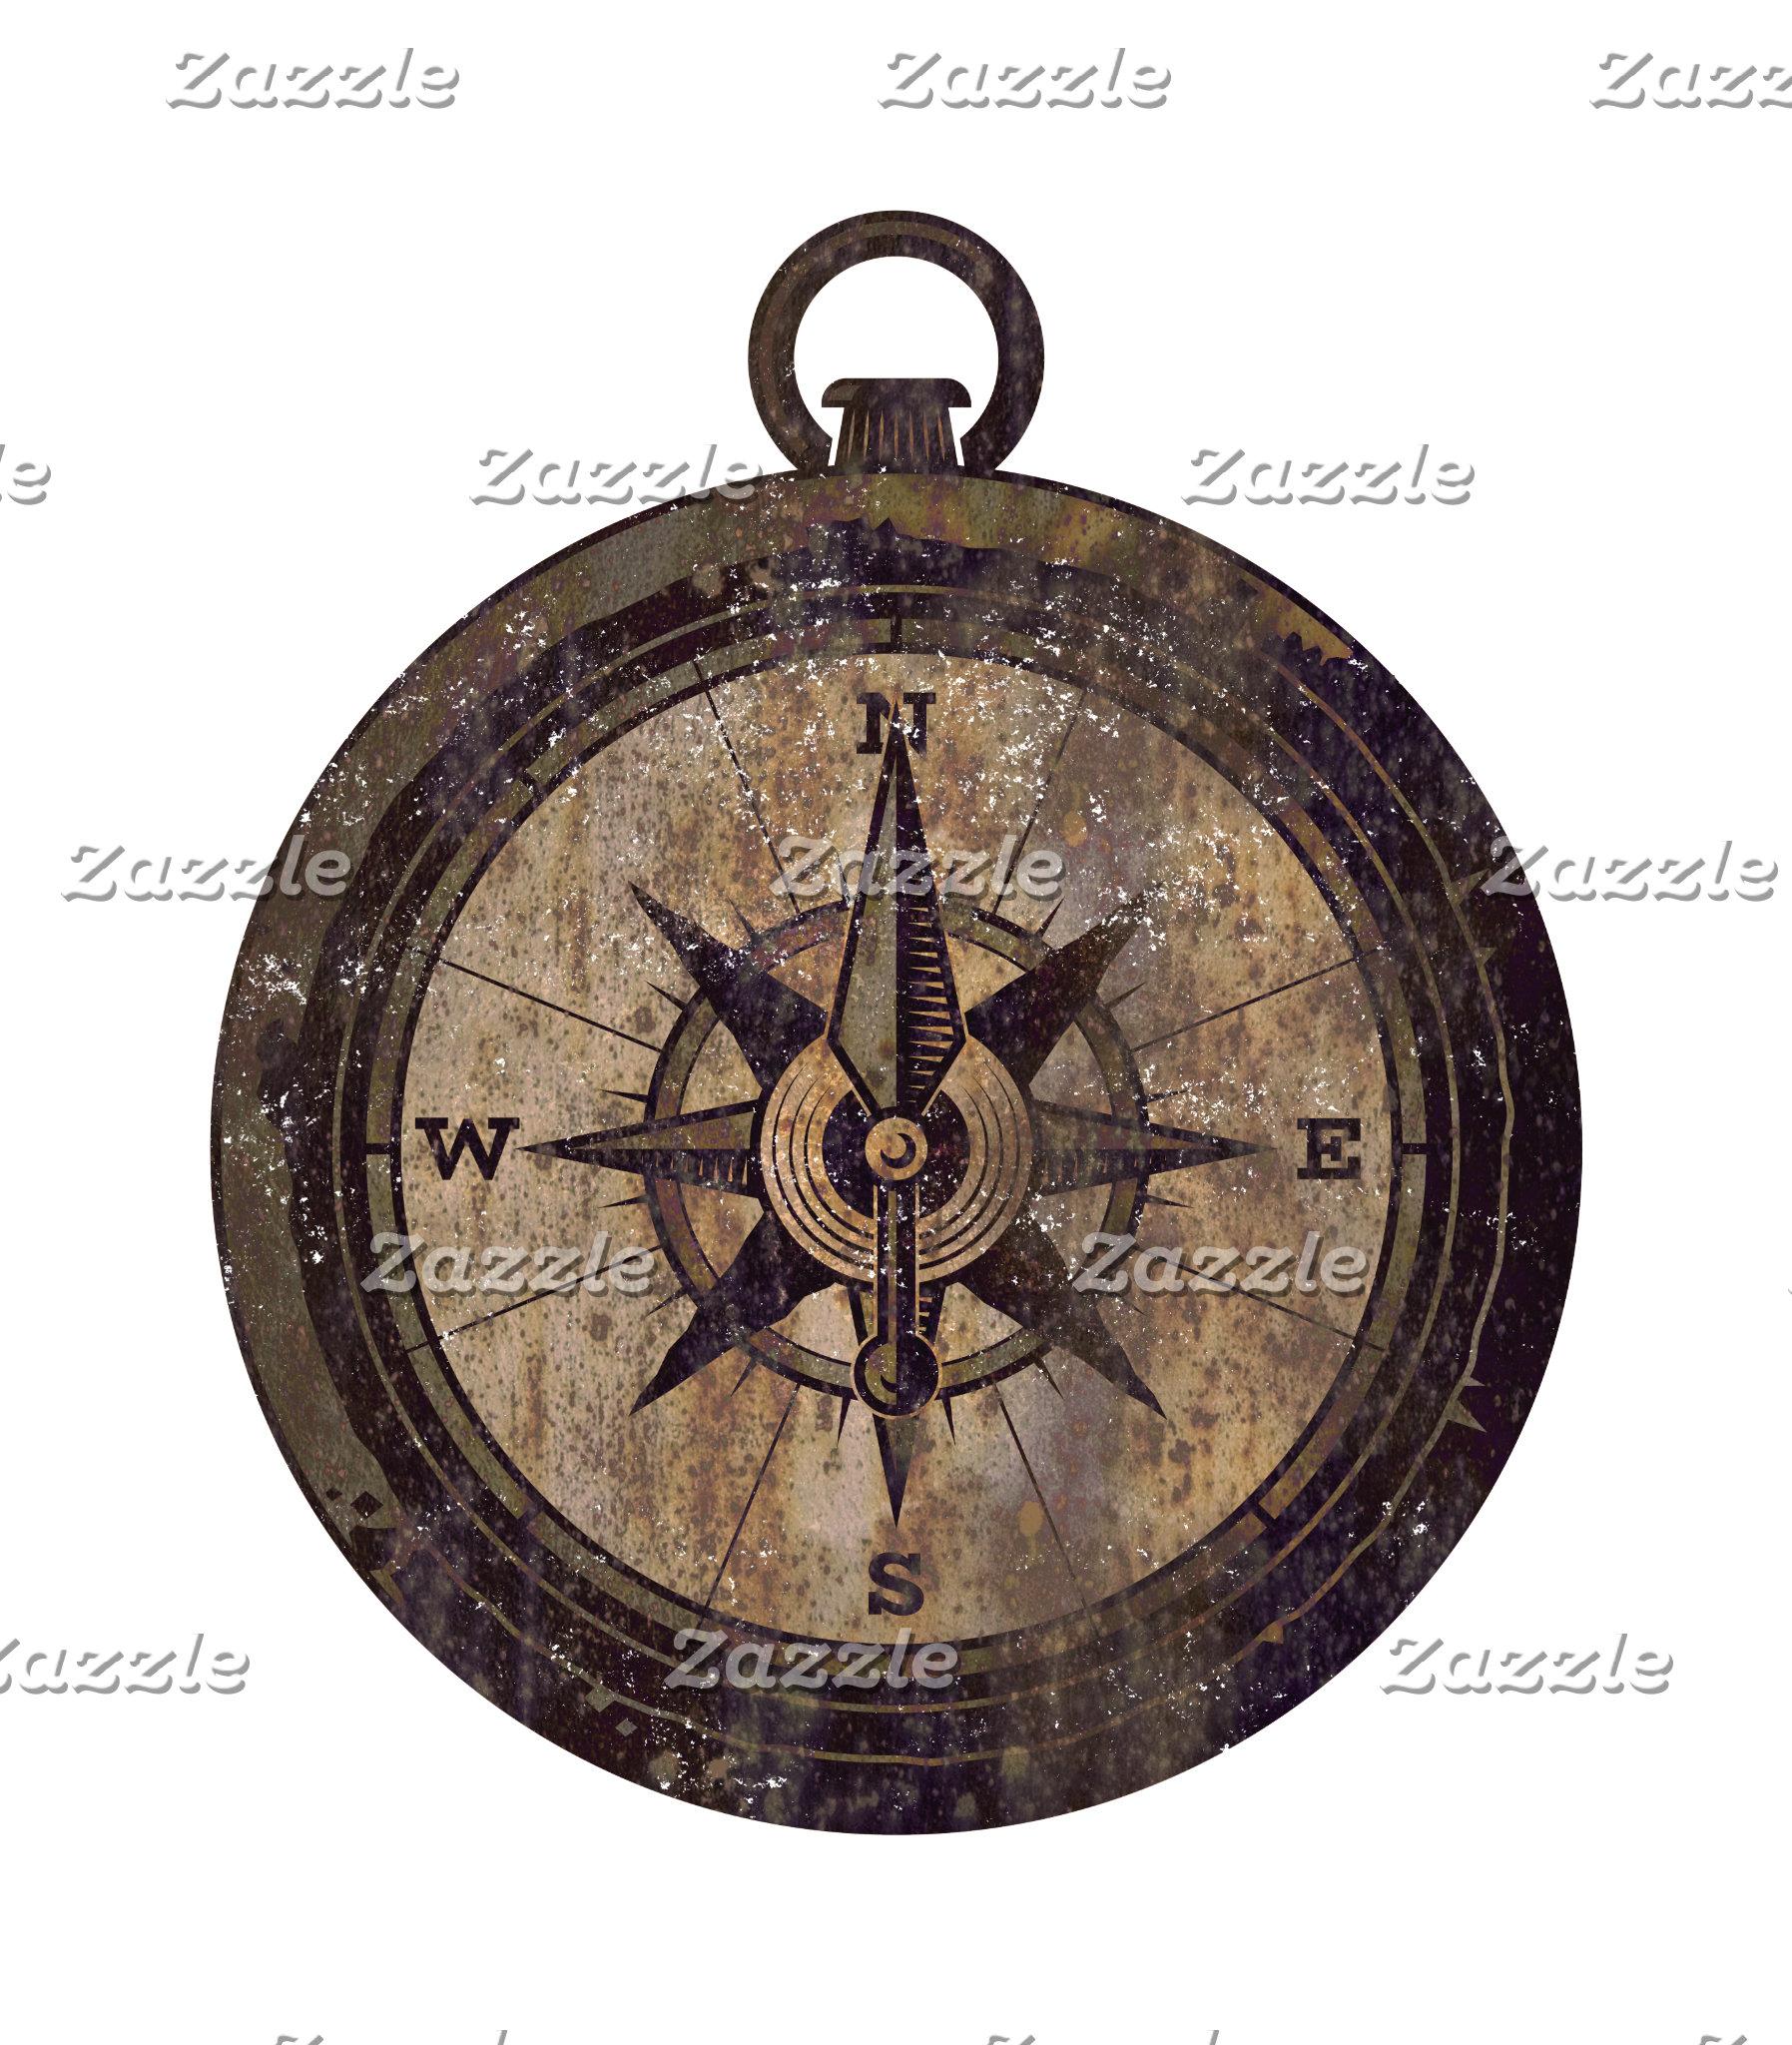 ► Vintage compass